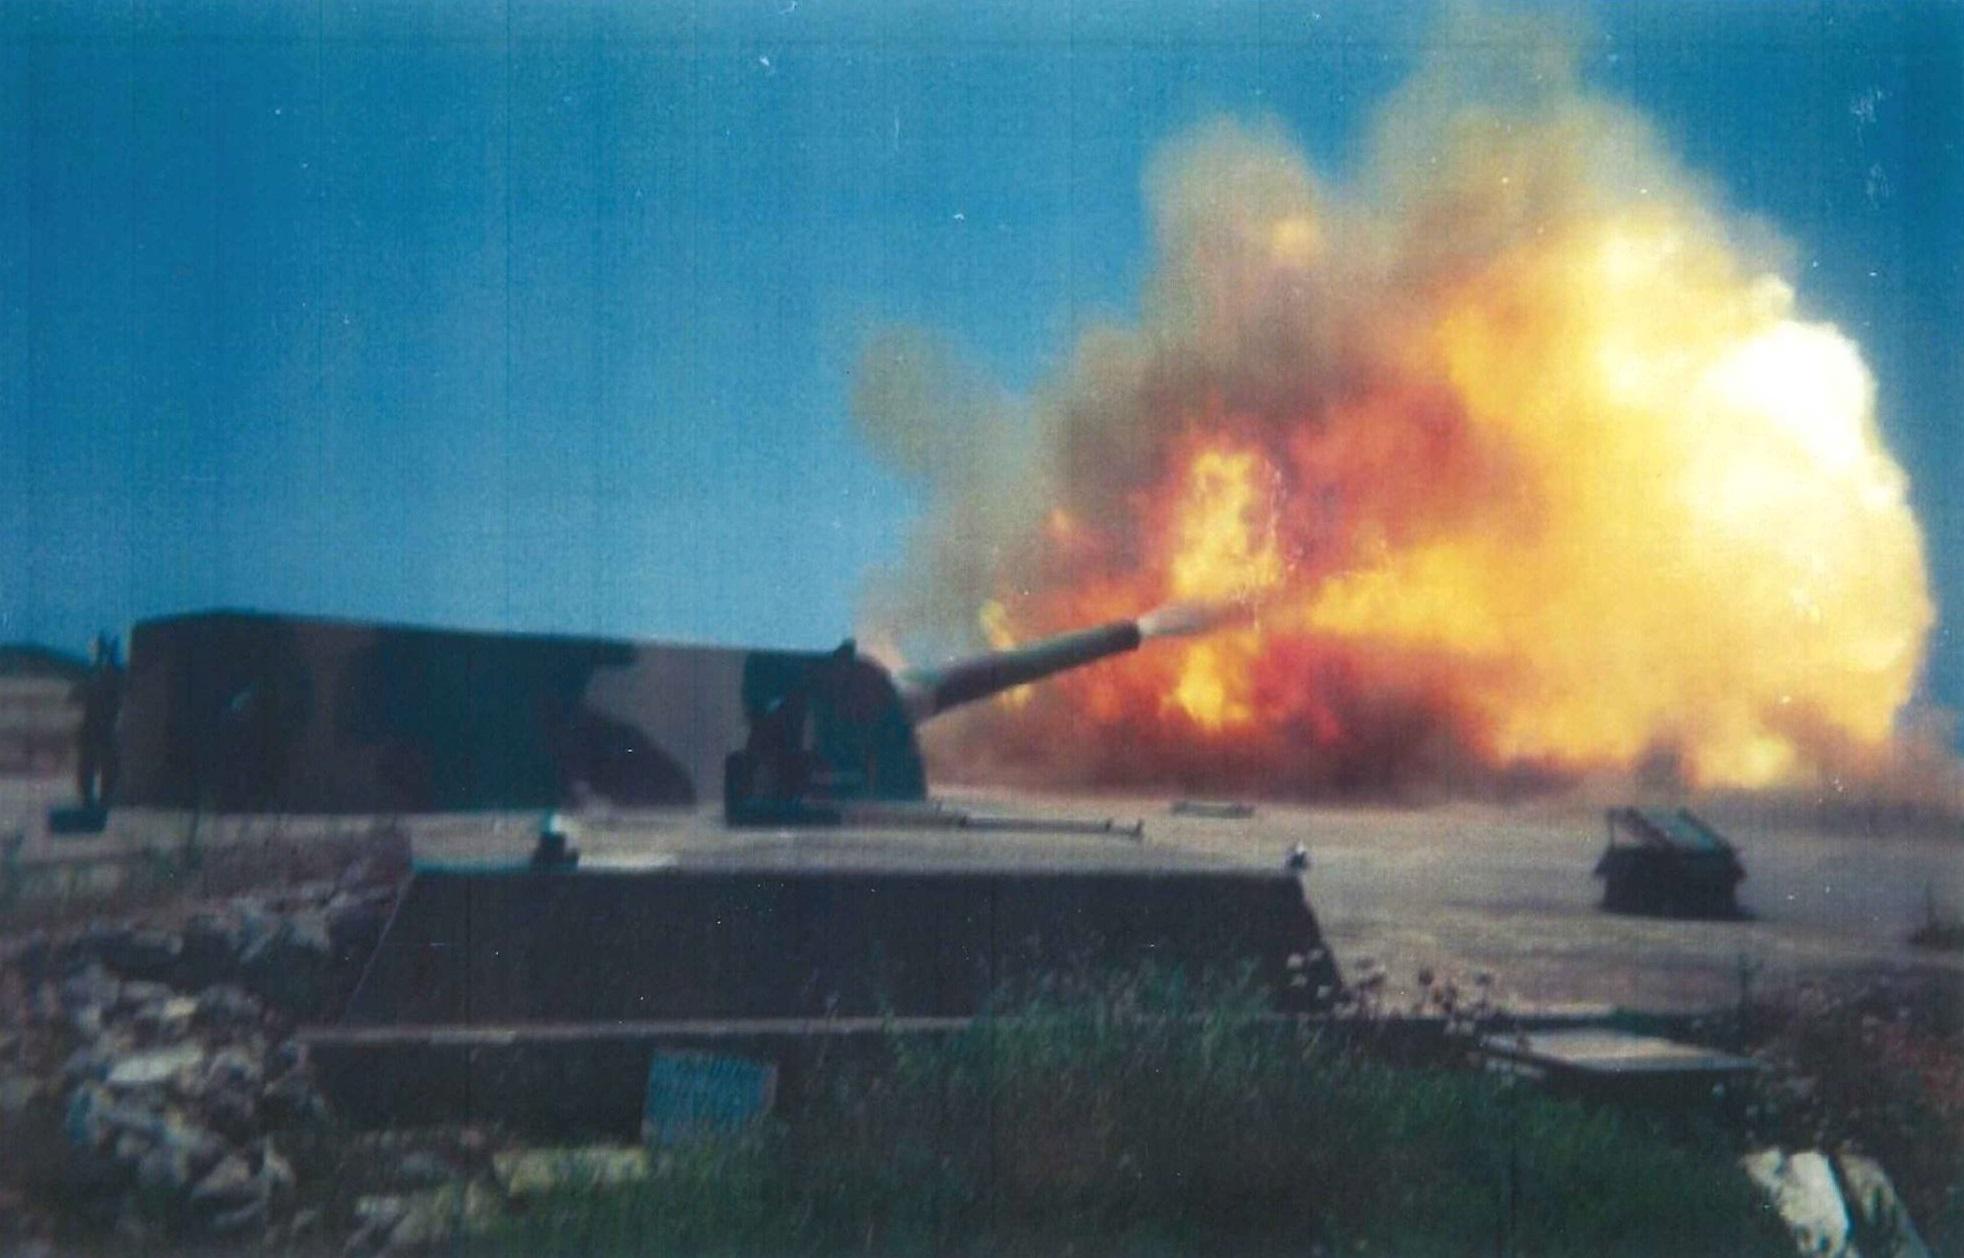 15 inch Vickers gun firing in the 1980s